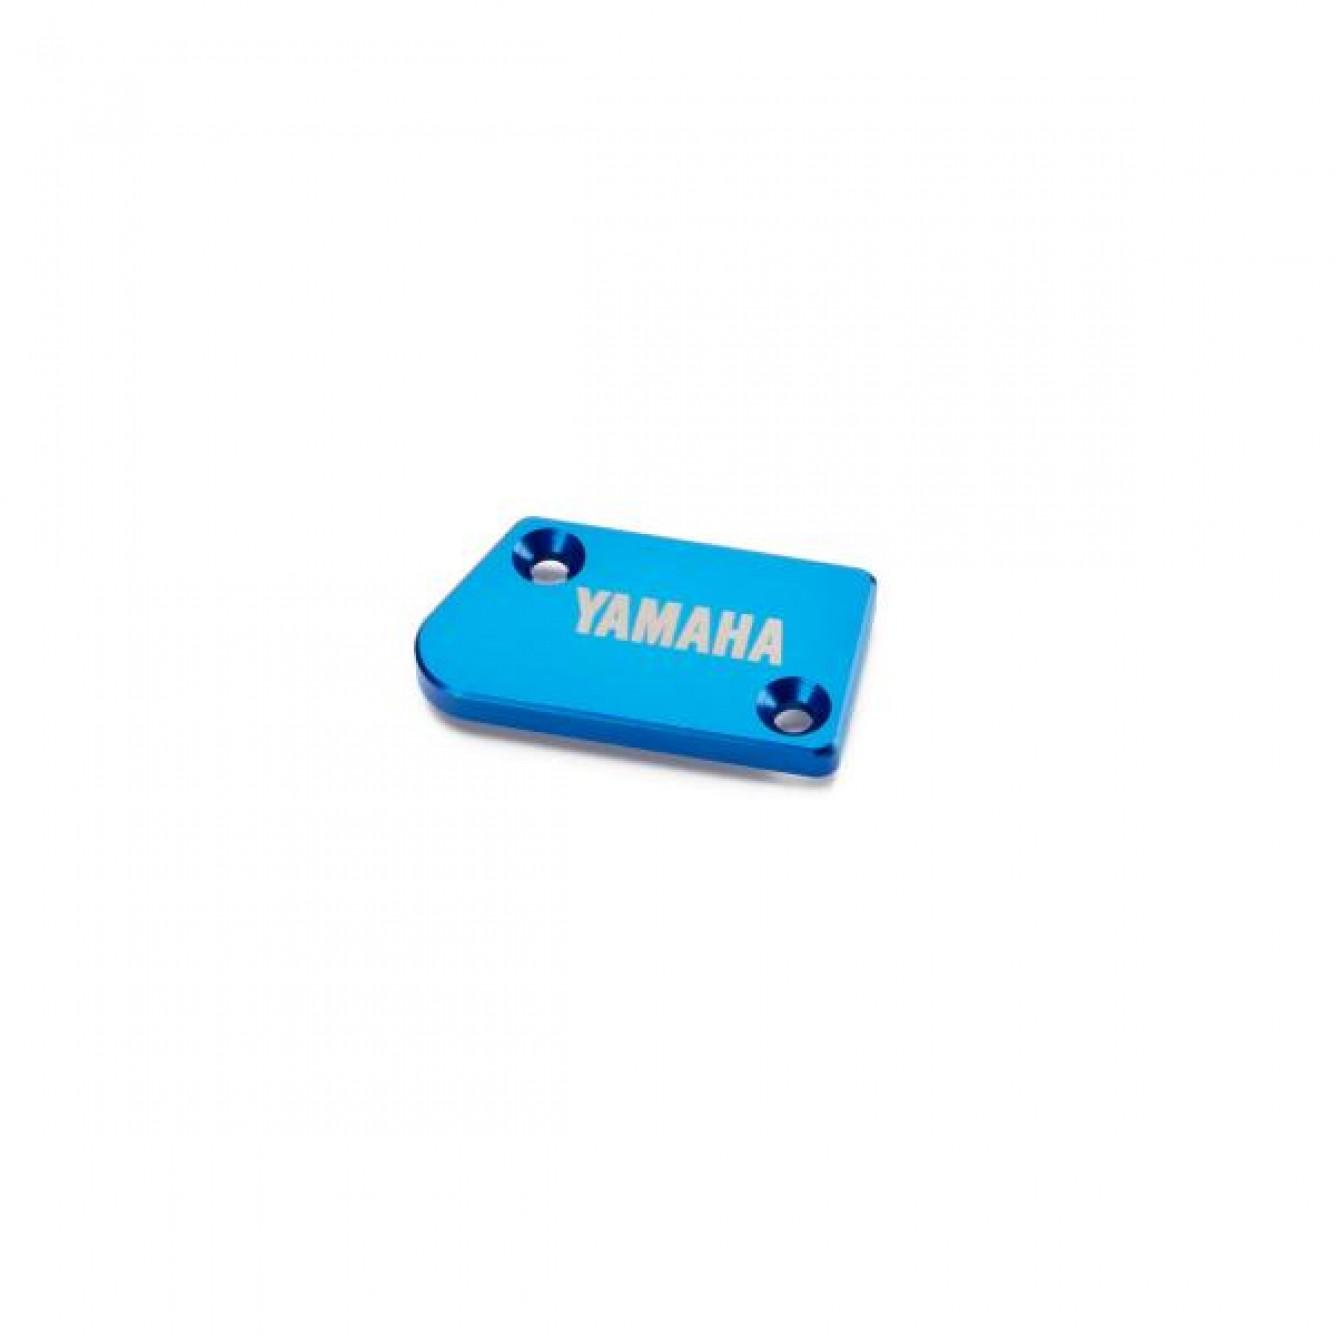 Yamaha   GYTR Voorremreservoirdeksel Blauw